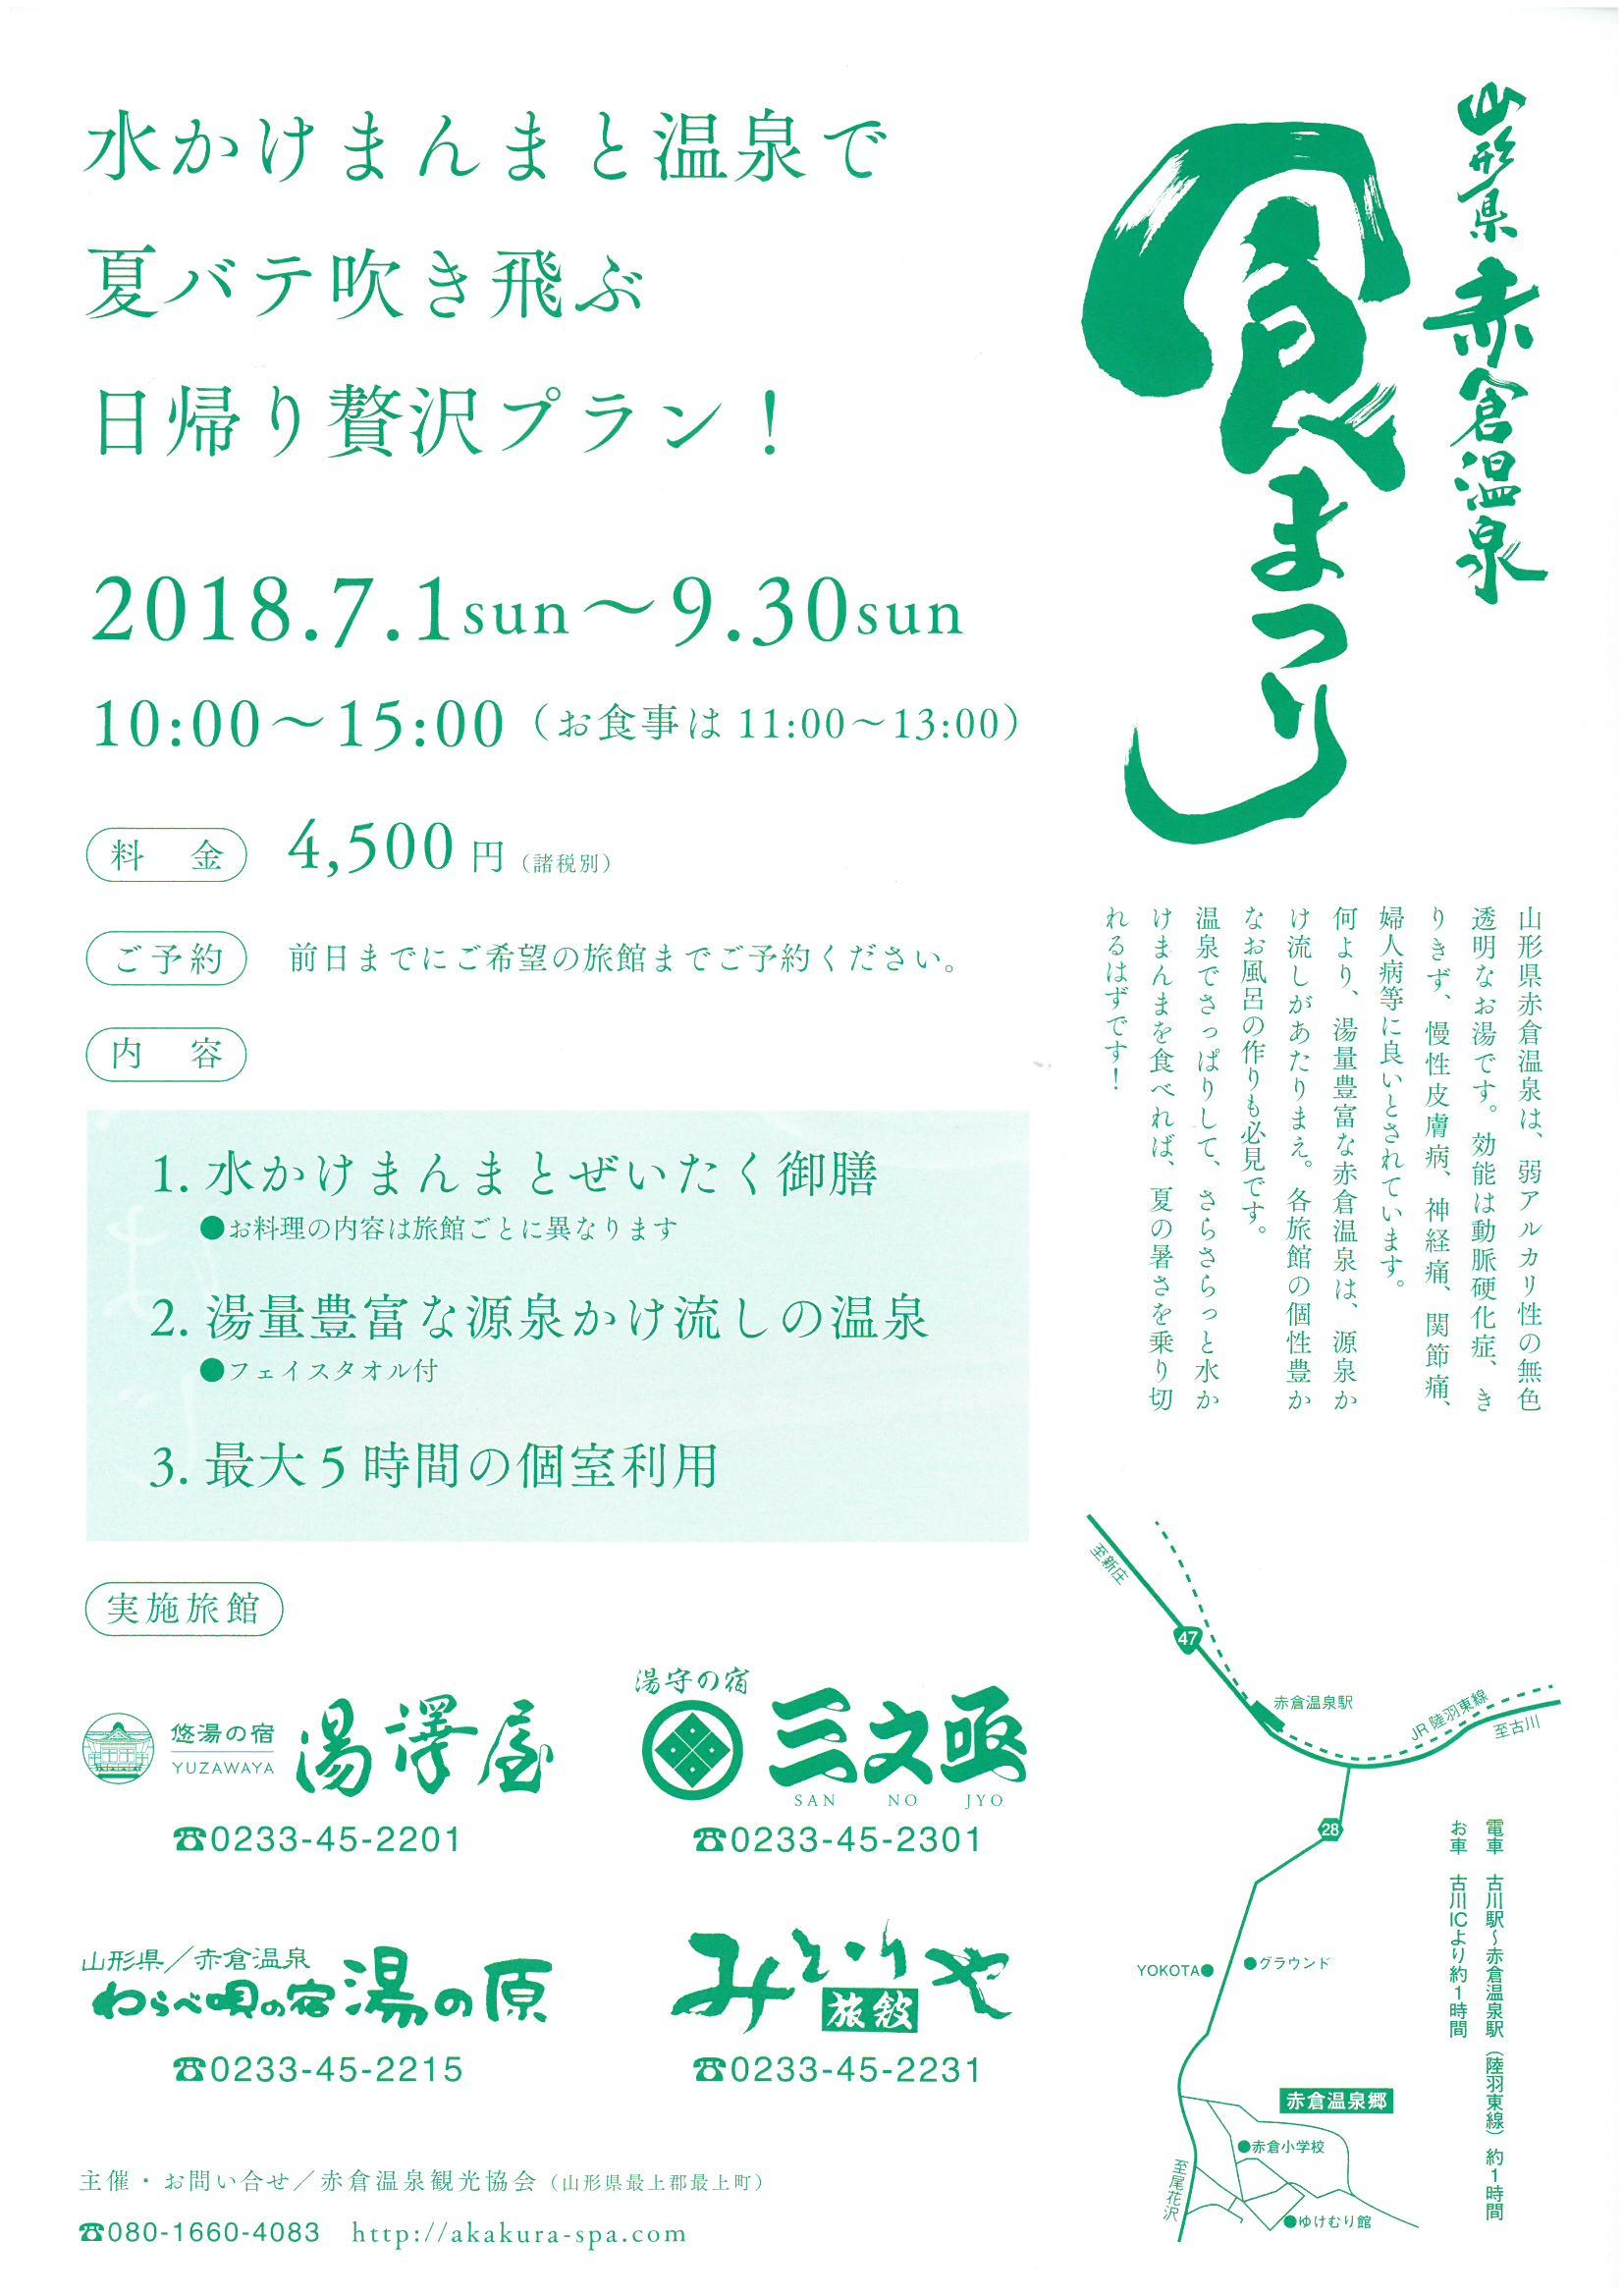 http://akakura-spa.com/oshirase/blog/SKM_C224e18062909140.jpg